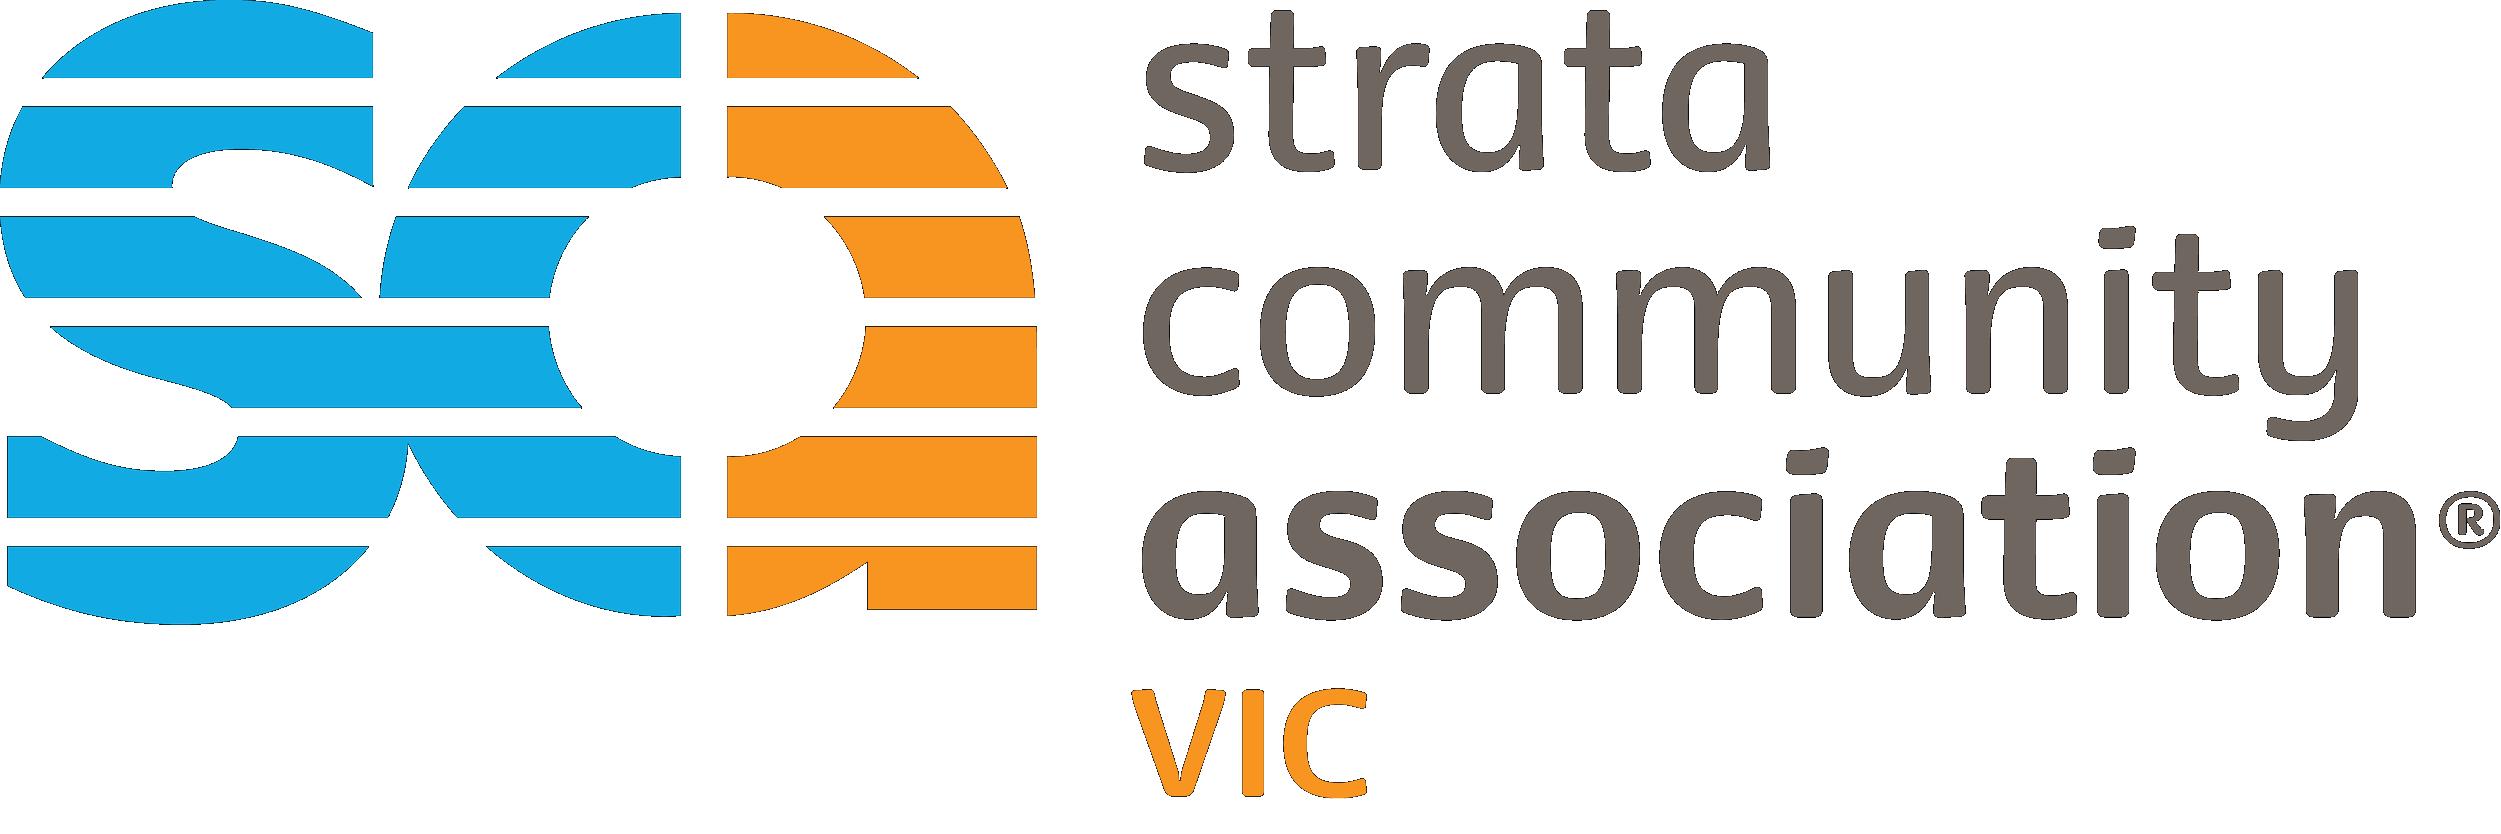 Strata Community Association Victoria logo.